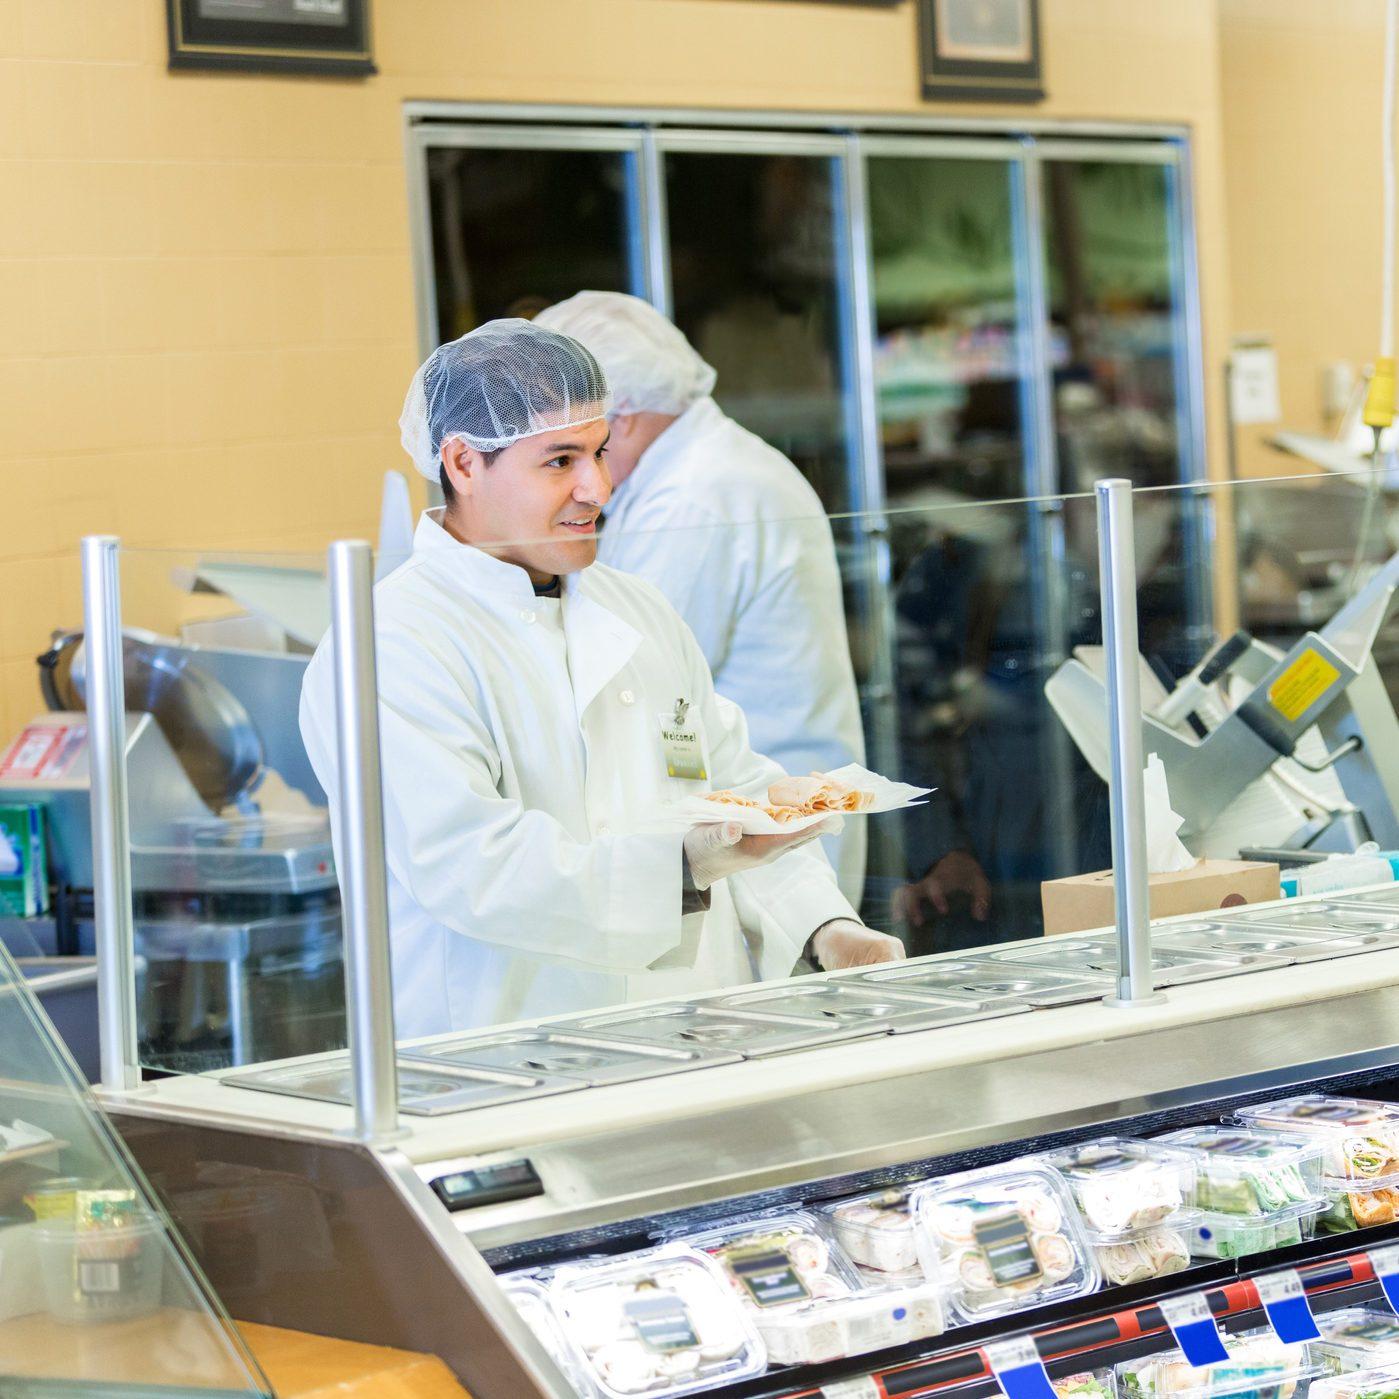 Deli employee packaging meat order for supermarket customer